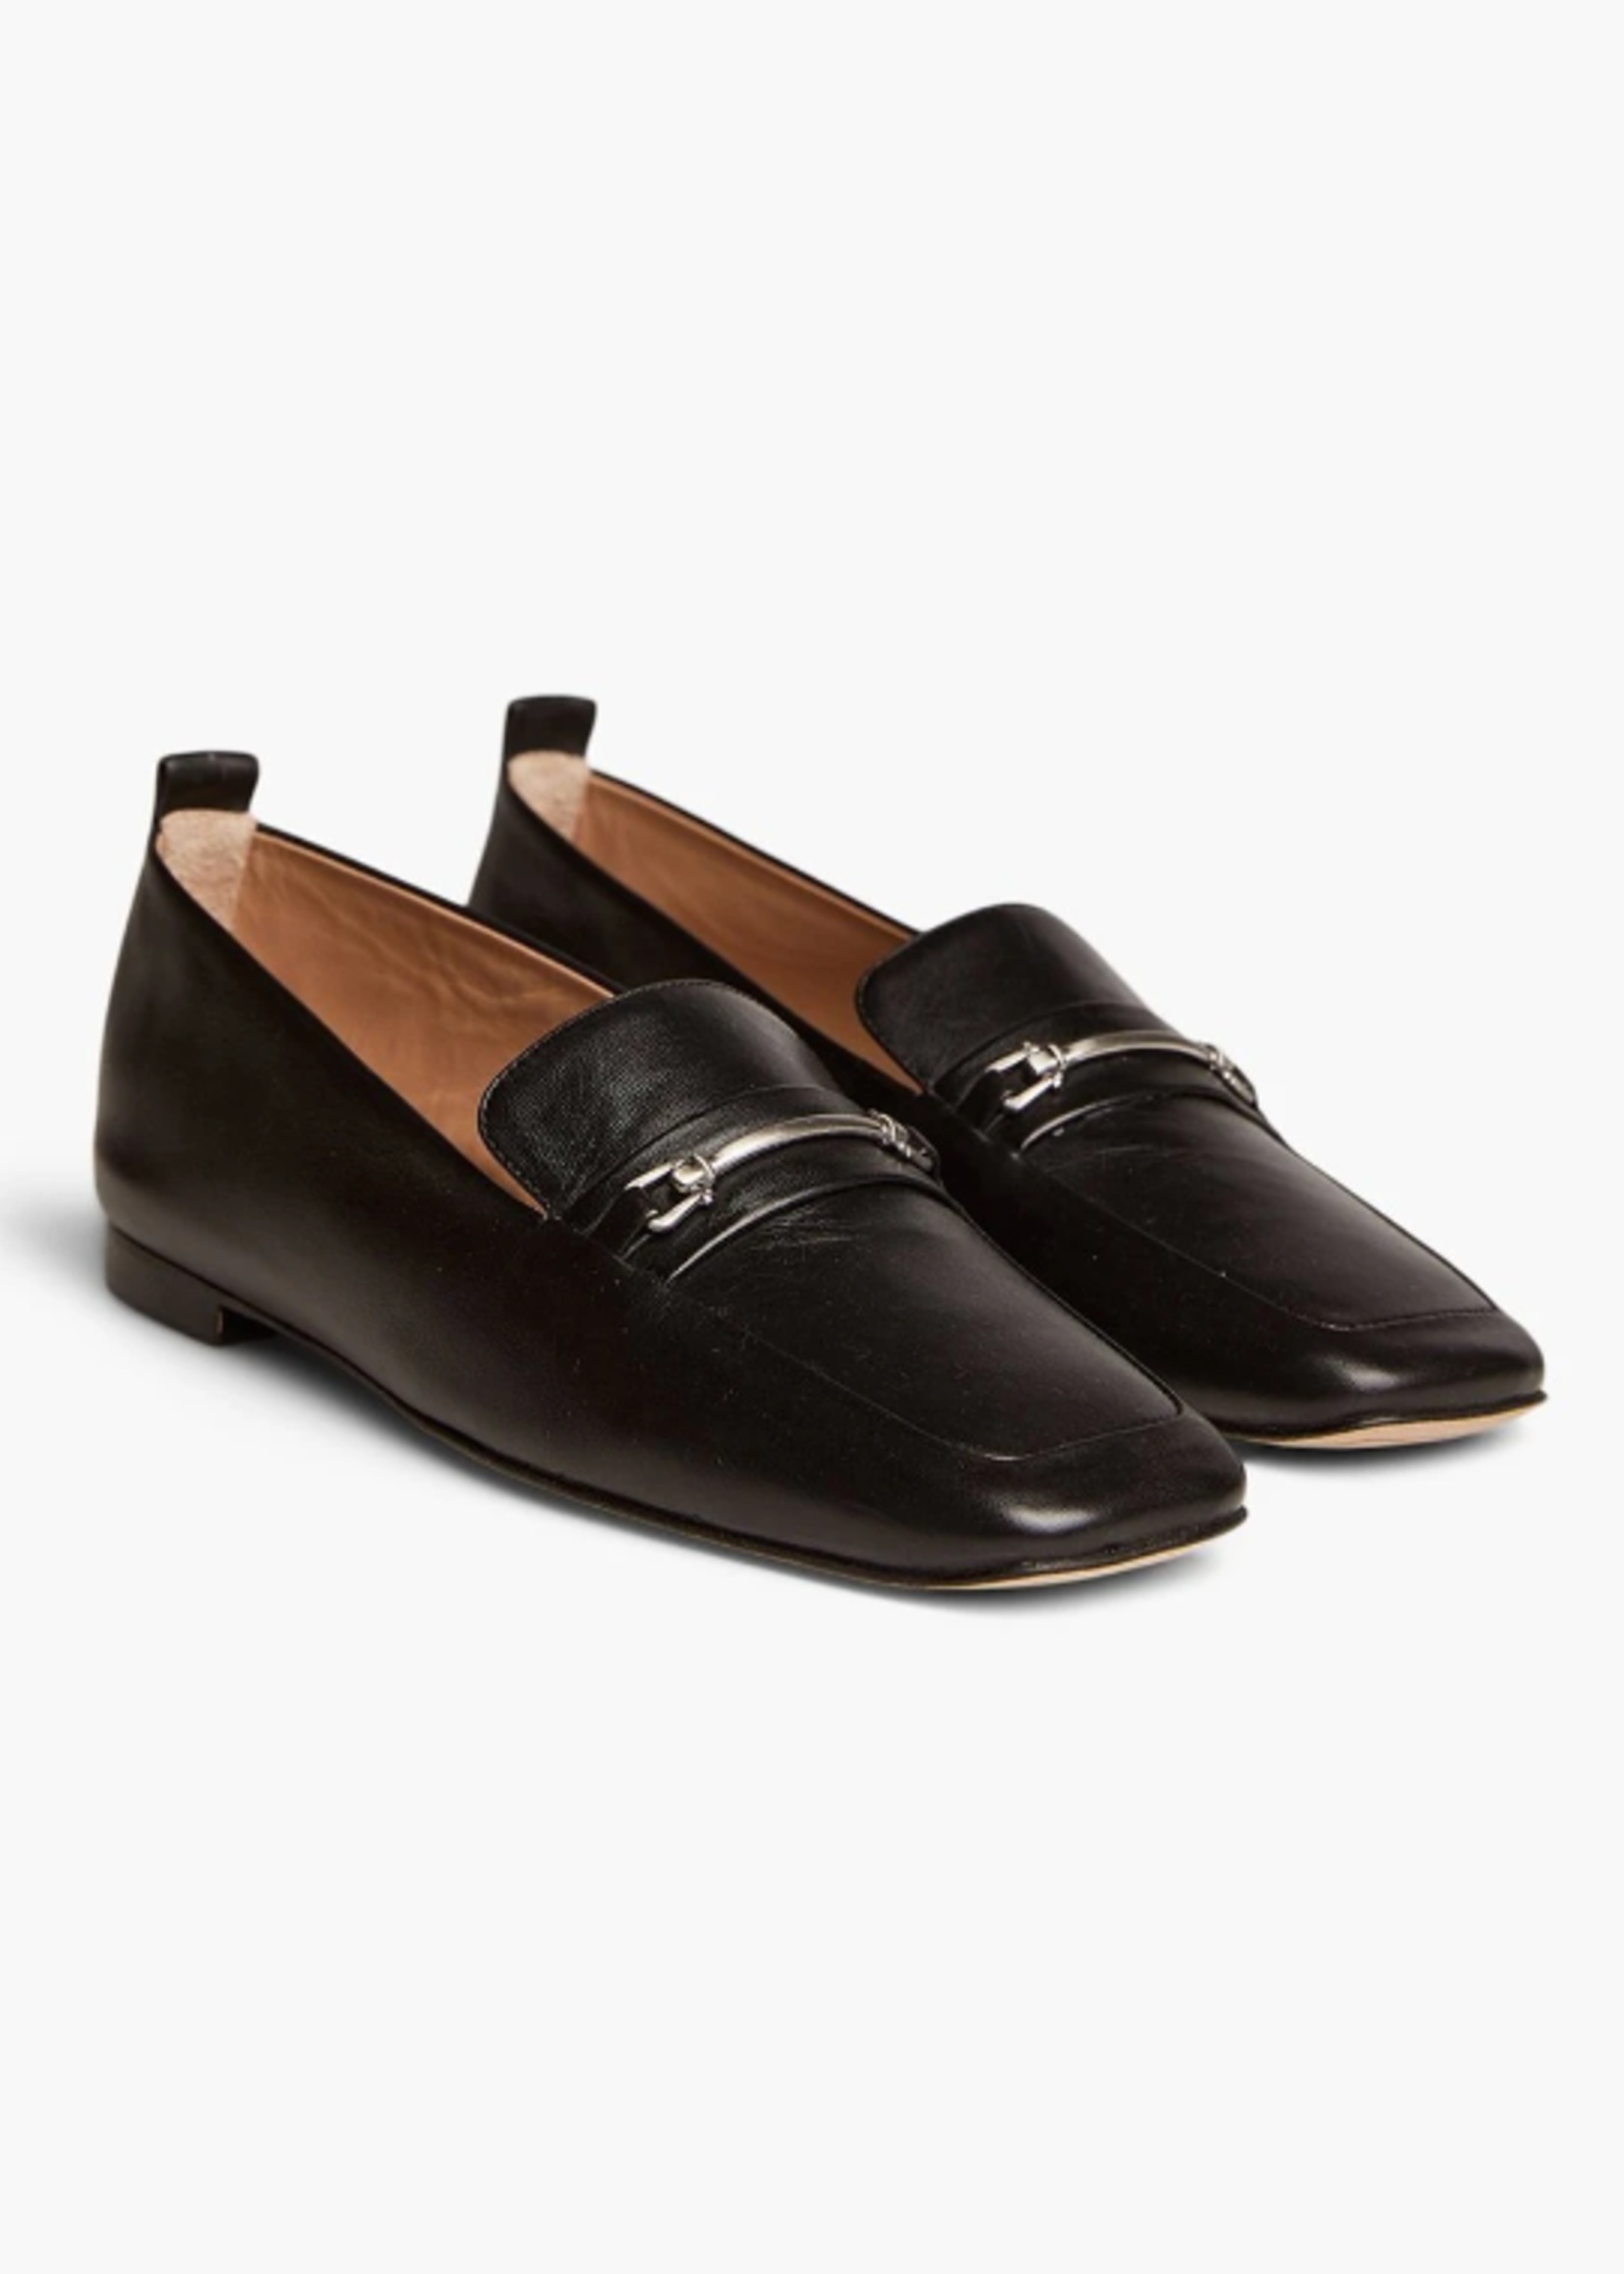 Elitaire Boutique The Diane Black Loafer